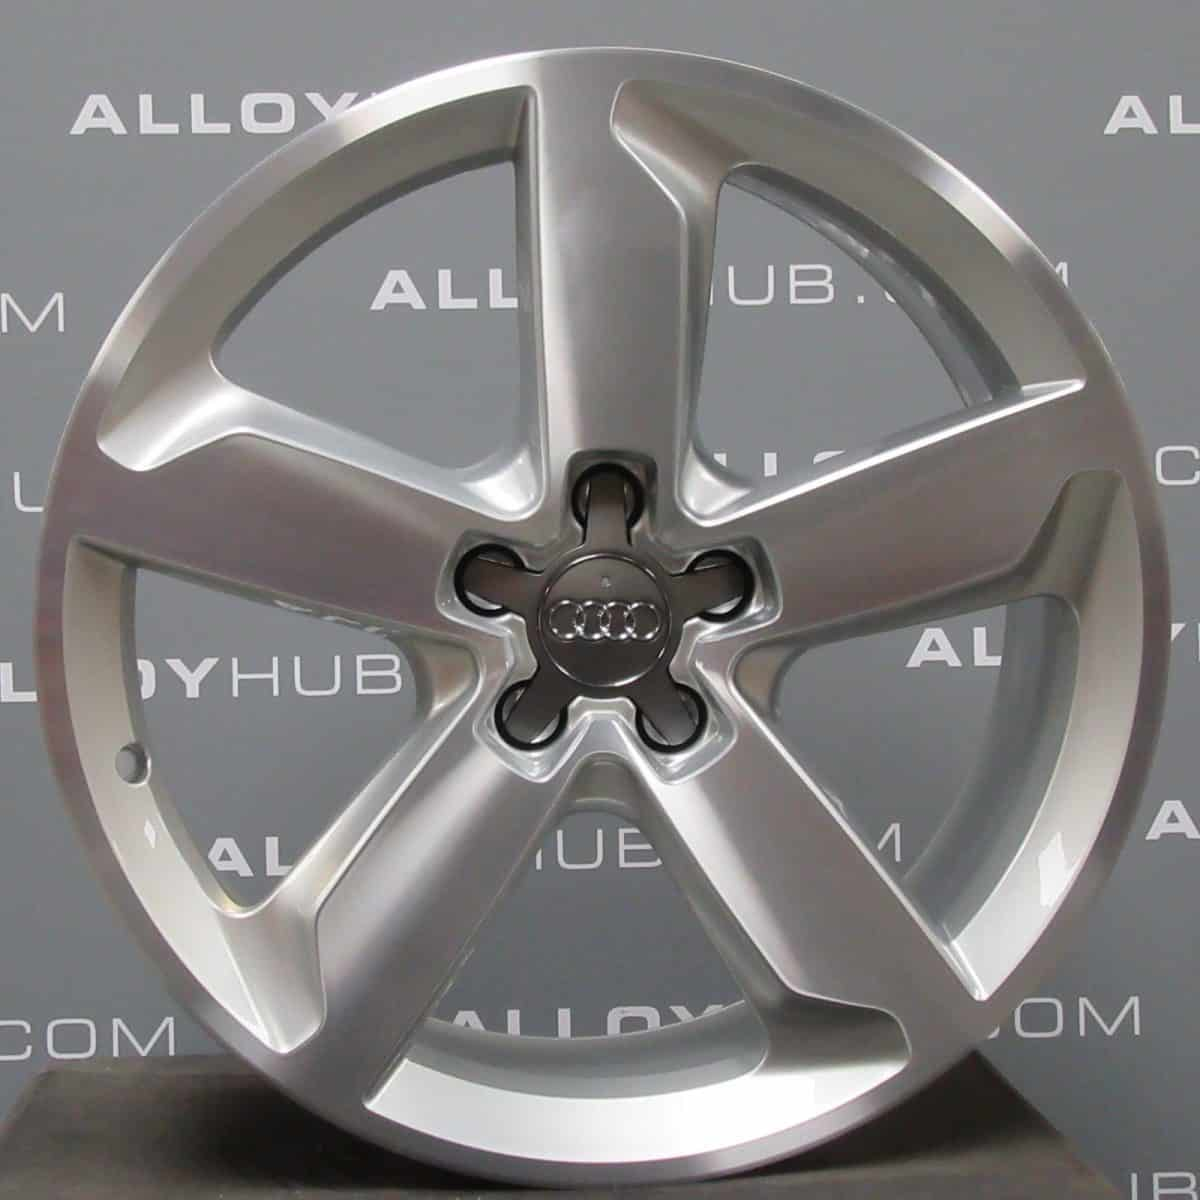 "Genuine Audi Q5 8R 5 Spoke 19"" Inch Alloy Wheels with Silver & Diamond Turned Finish 8R0 601 025 J"